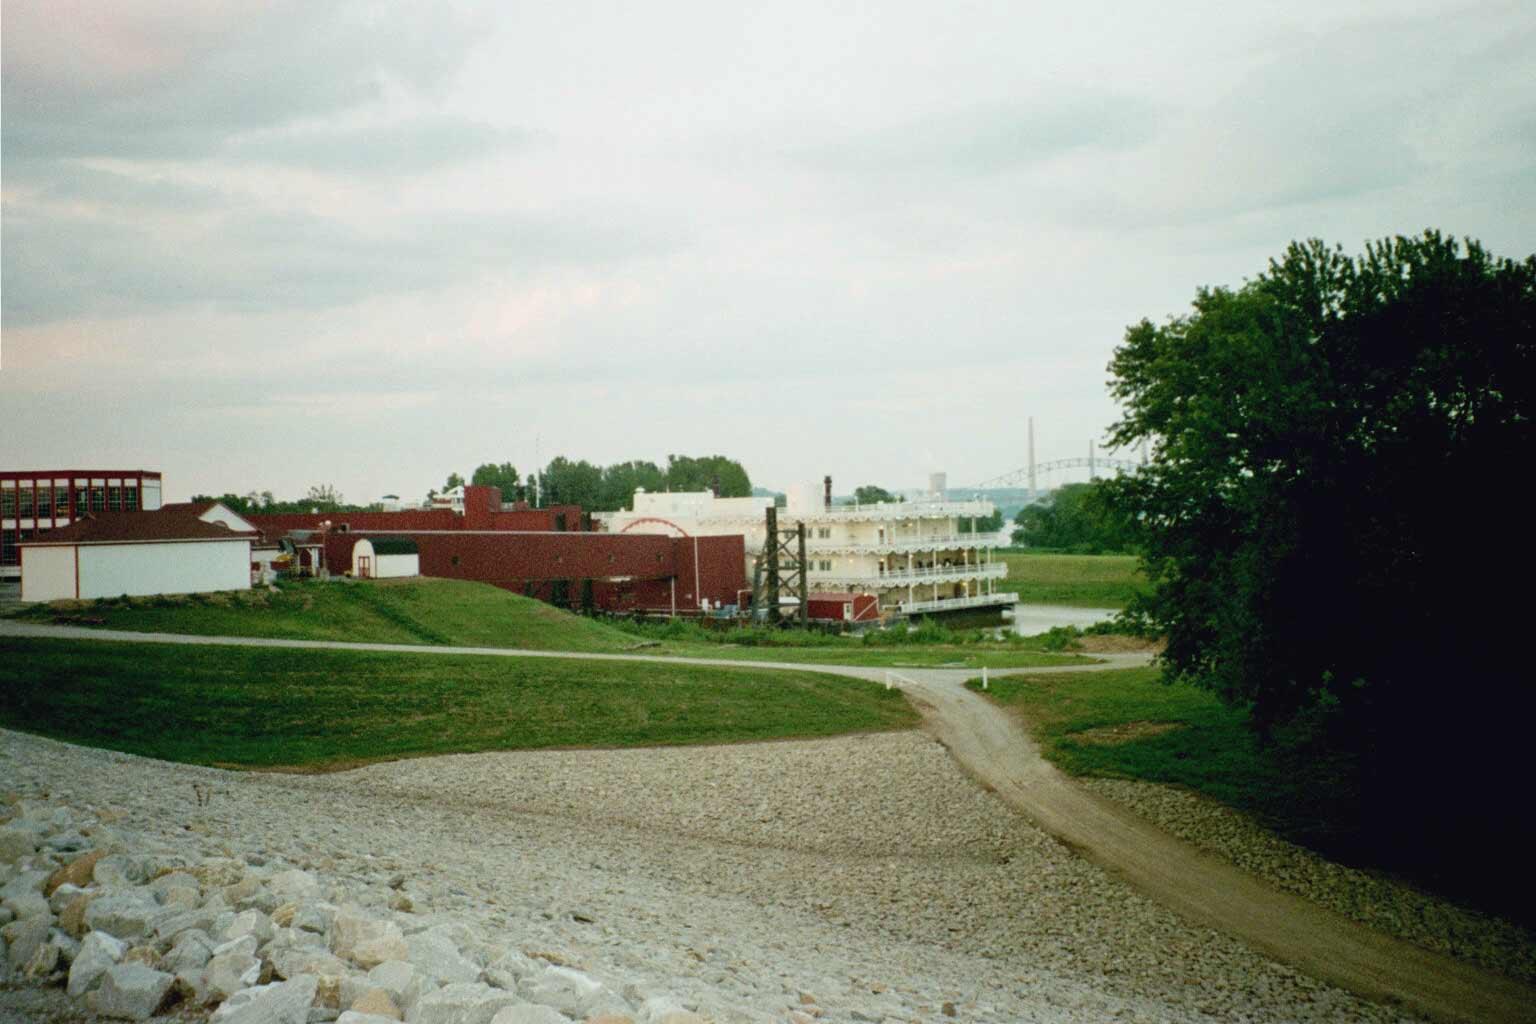 Riverboat casino lawrenceburg indiana